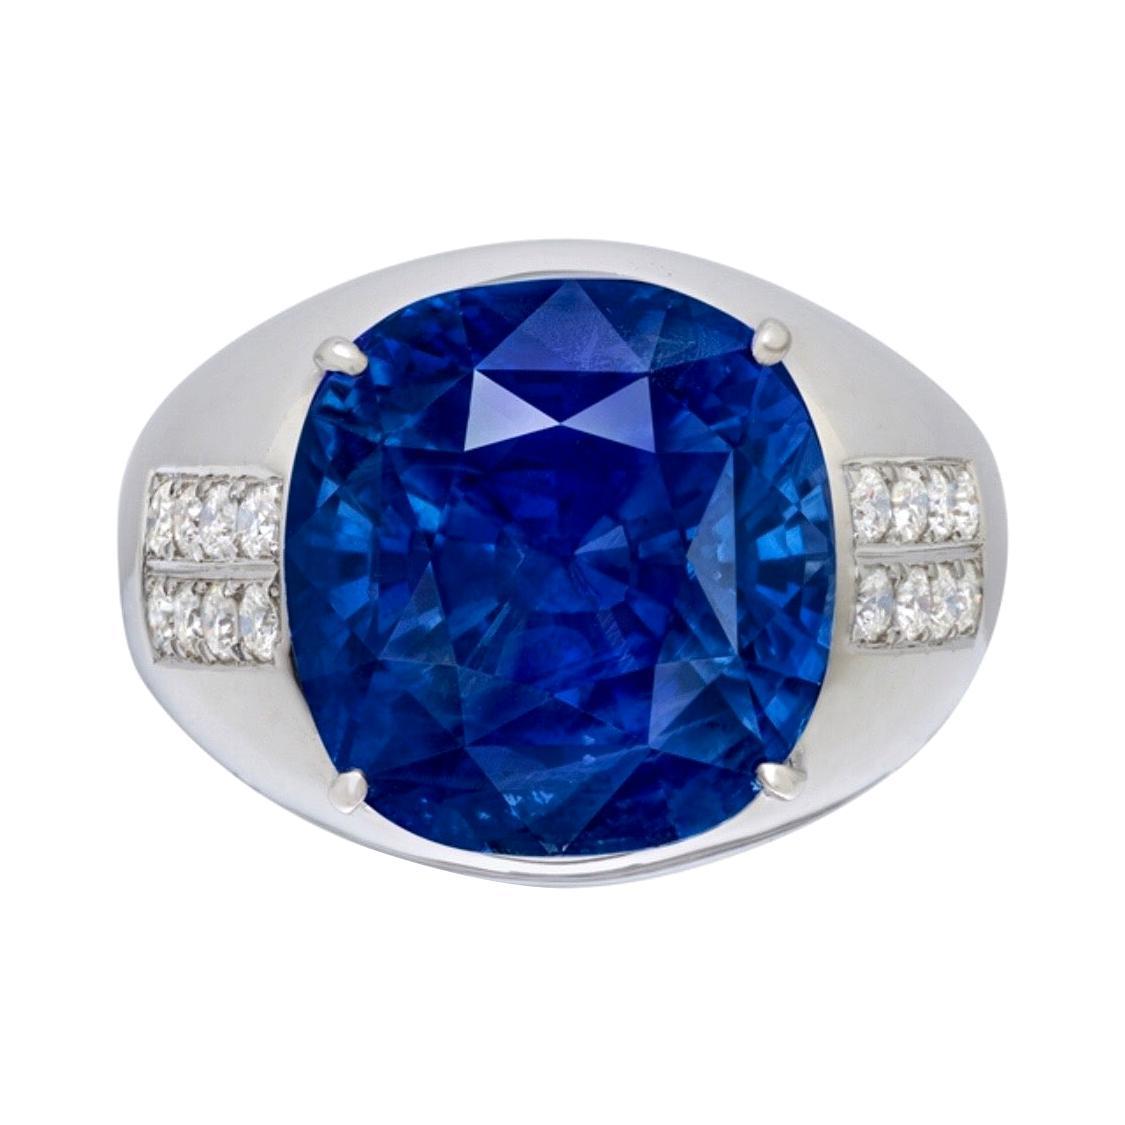 Emilio Jewelry 22 Carat Unheated Ceylon Sapphire Ring